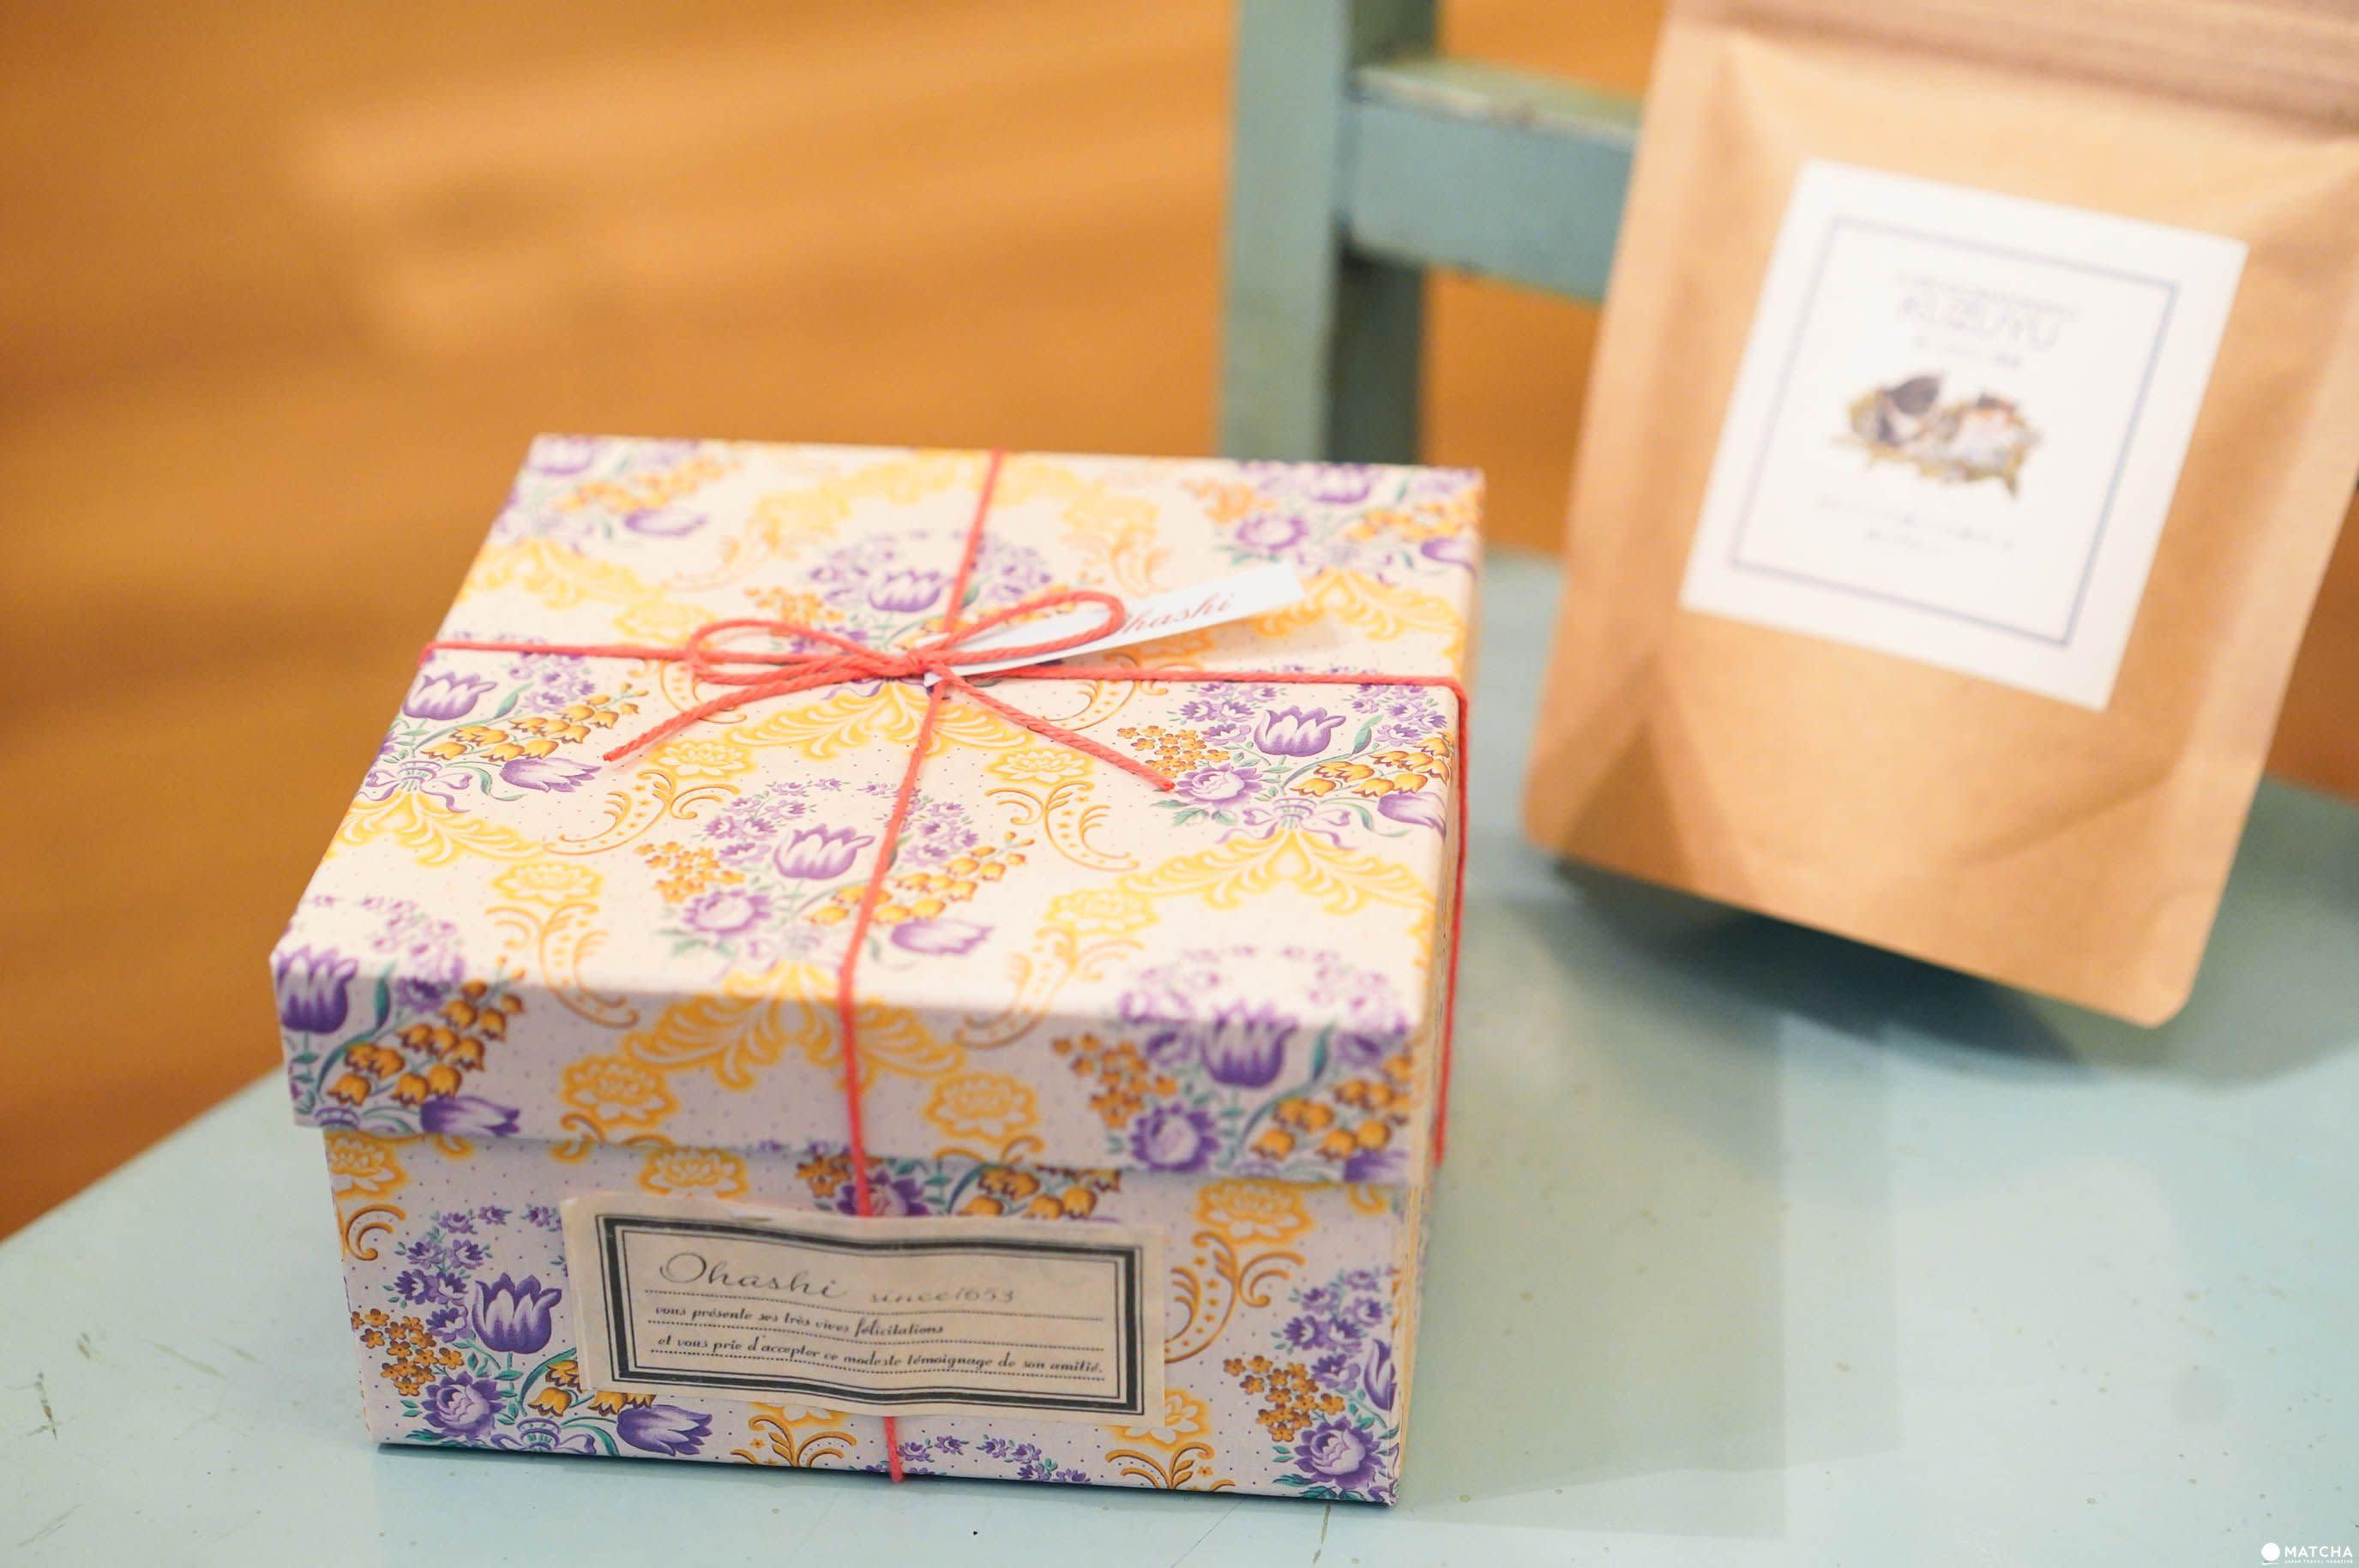 中野伴手禮OHASHI日本茶盒